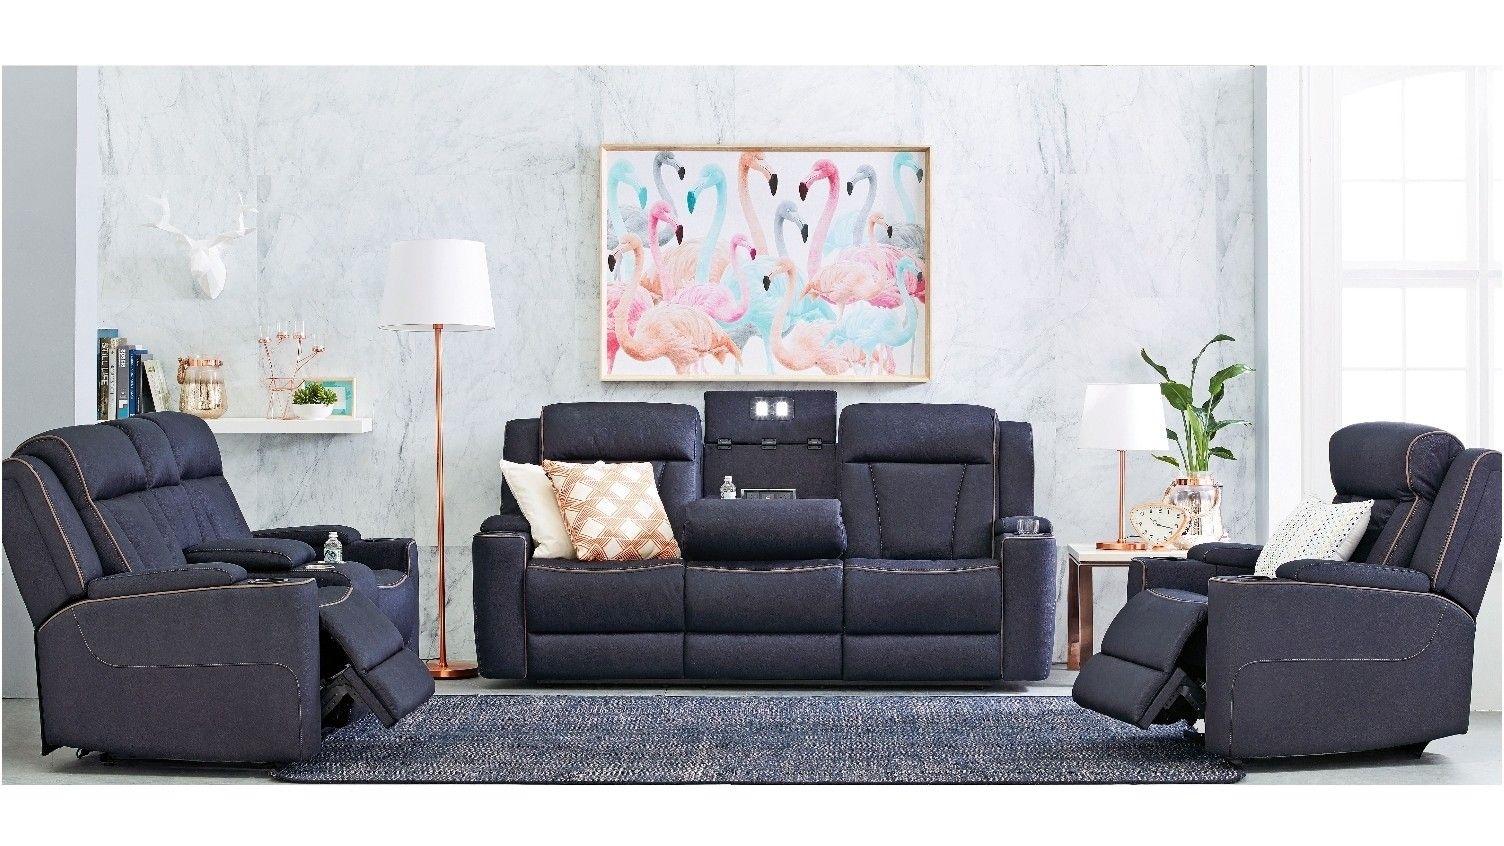 trinity 3 seater fabric lounge powered recliner house renovation rh pinterest com